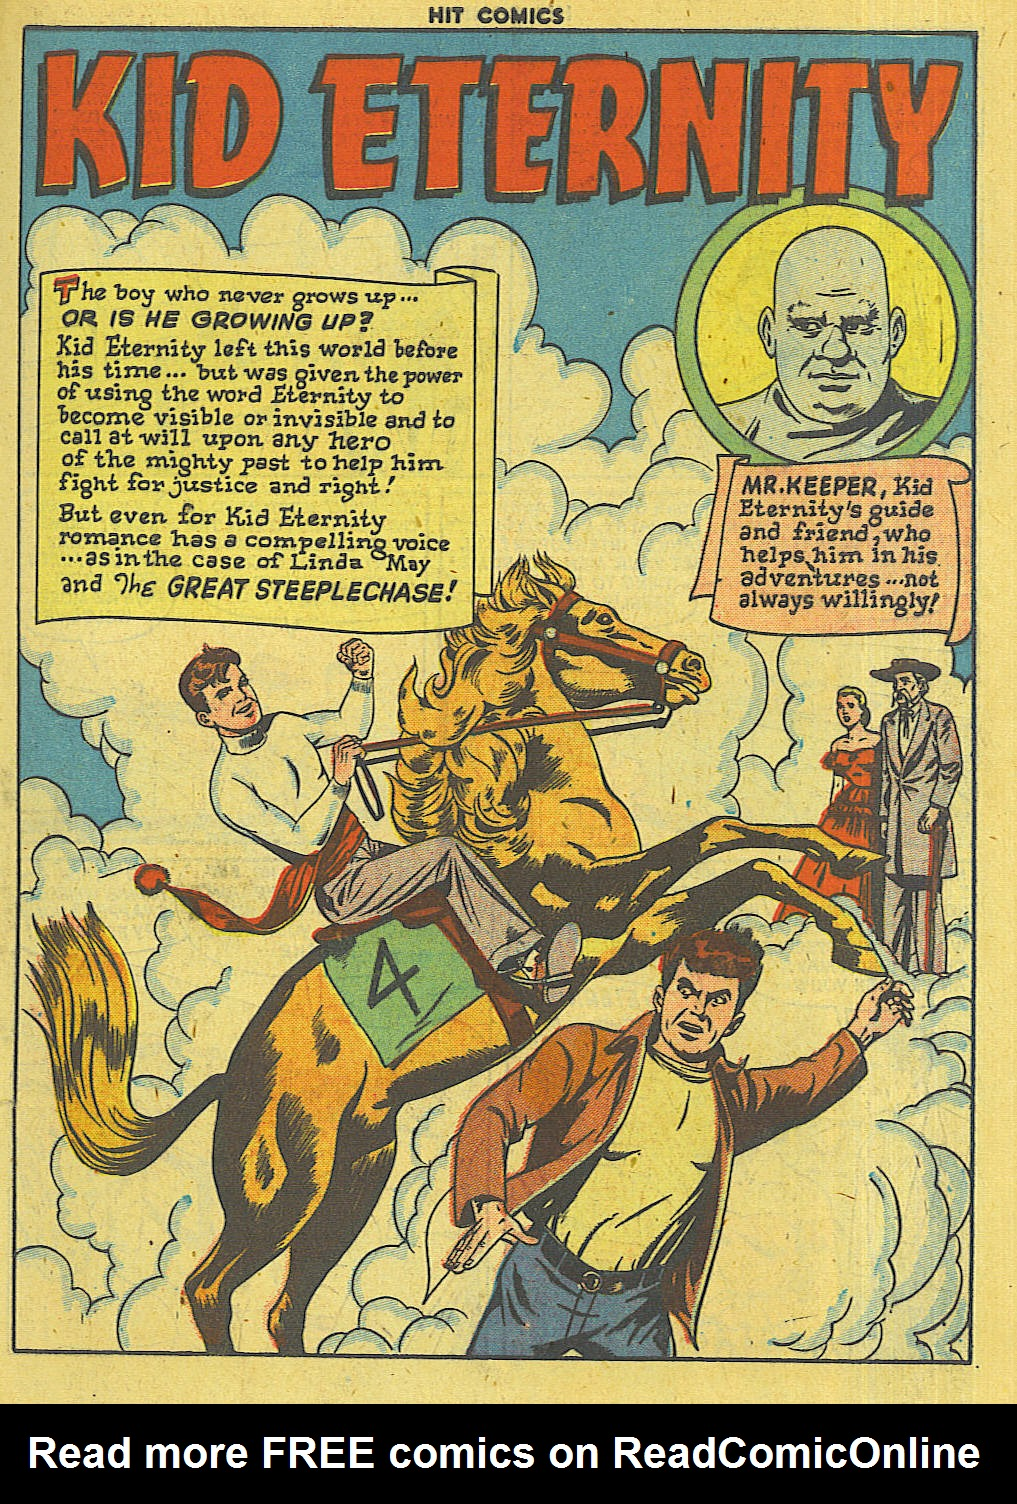 Read online Hit Comics comic -  Issue #56 - 3